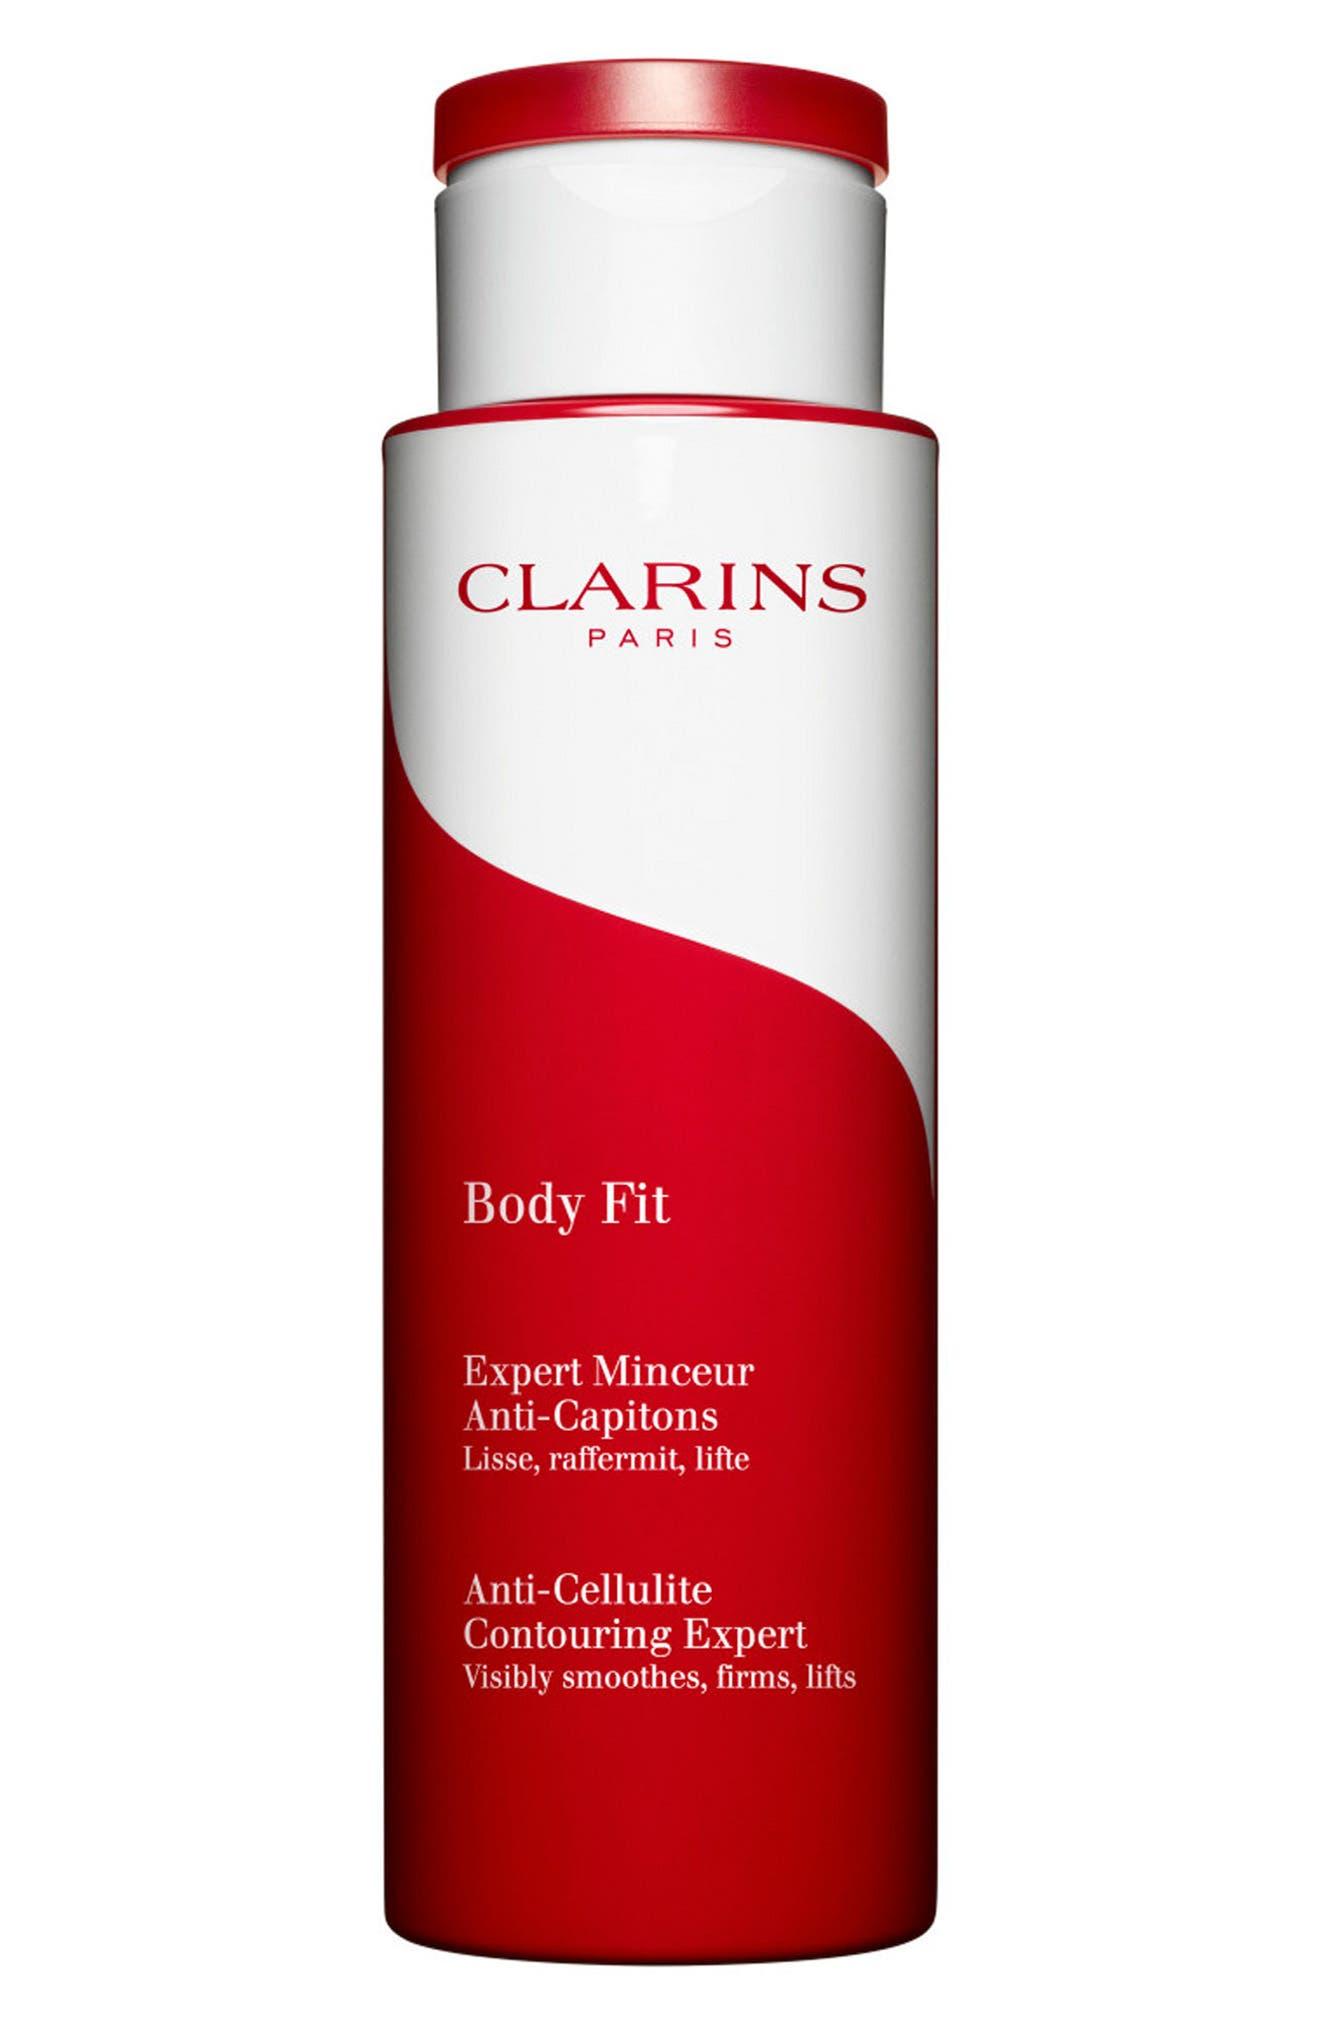 Body Fit Anti-Cellulite Contouring Expert,                             Main thumbnail 1, color,                             NO COLOR